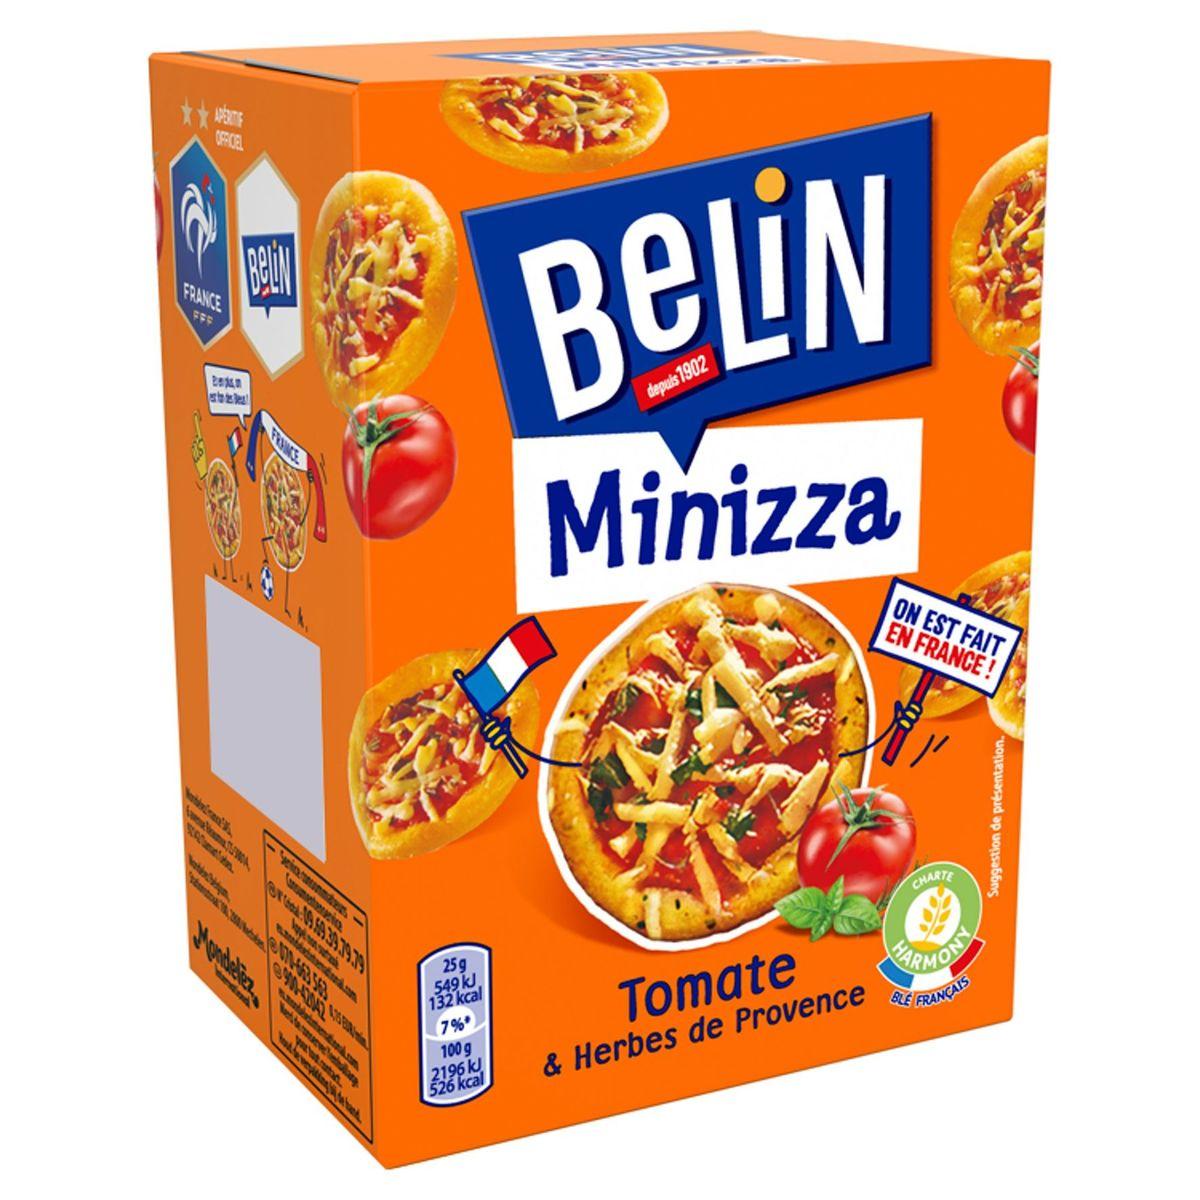 Belin Minizza Tomate & Herbes de Provence 85 g